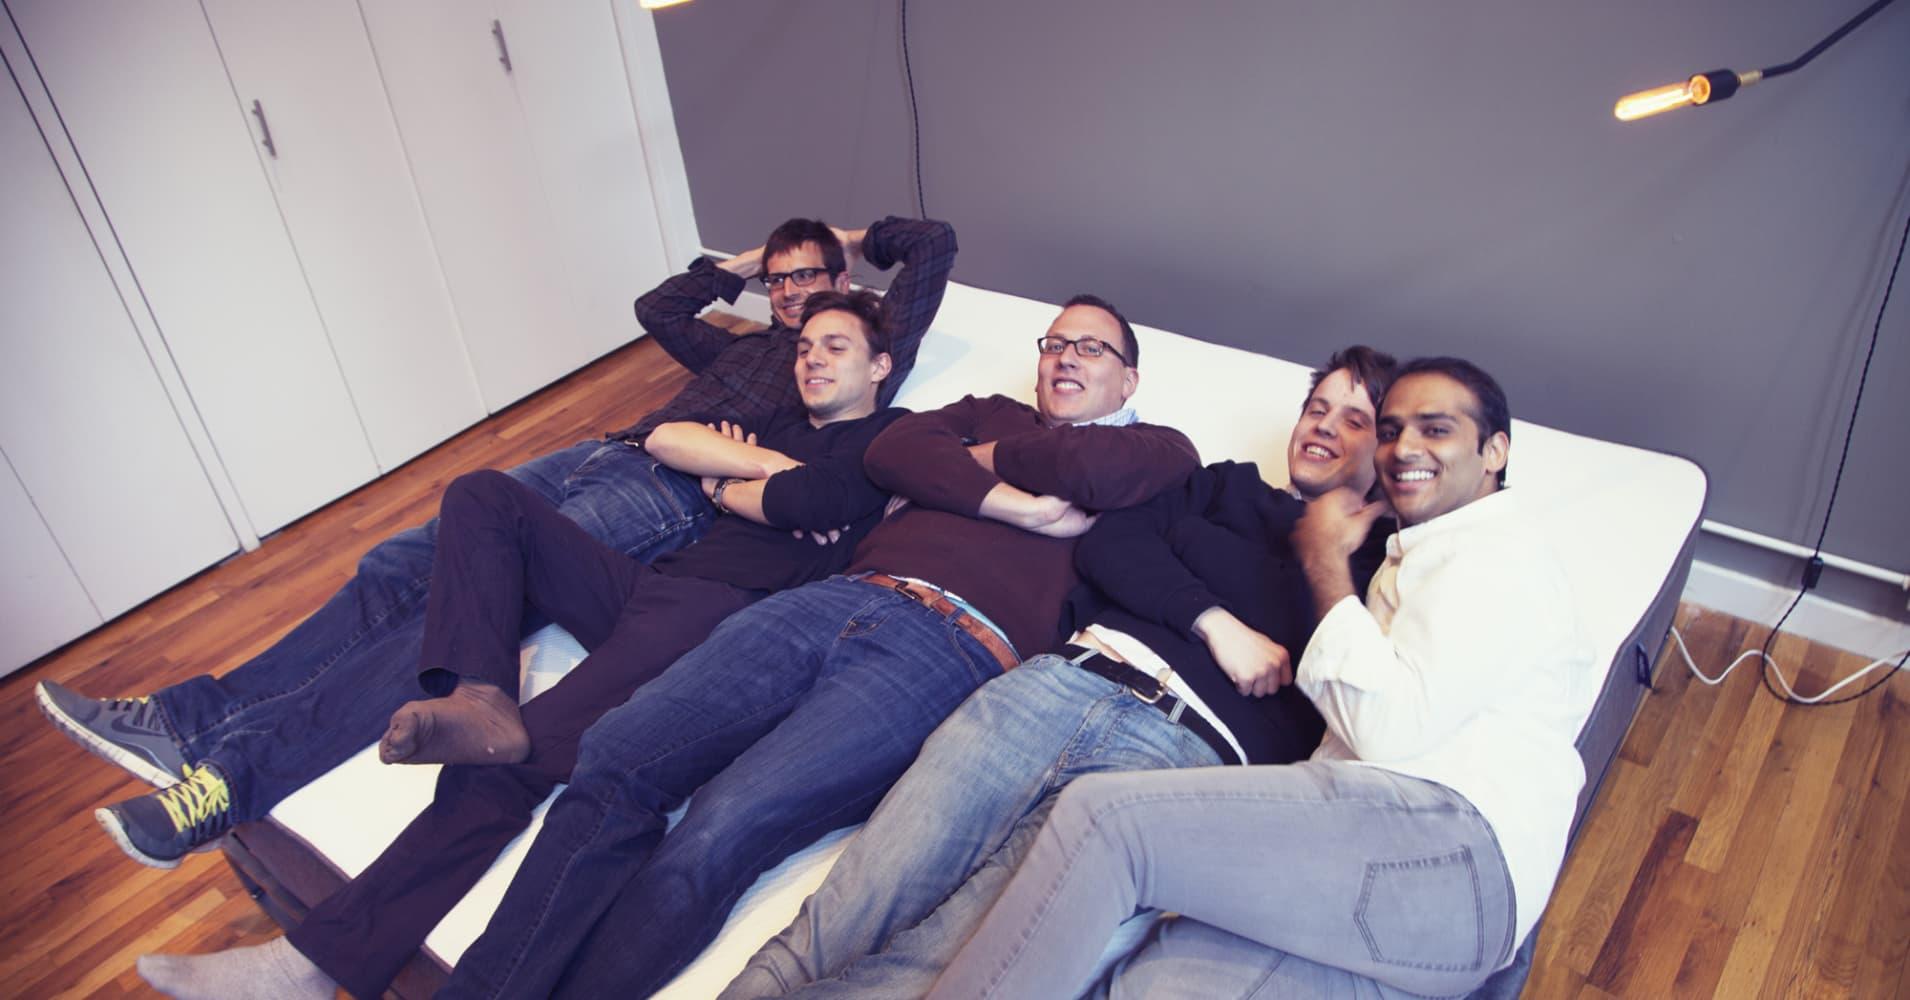 How Casper's founders went from $100,000 in debt to building a billion-dollar mattress start-up